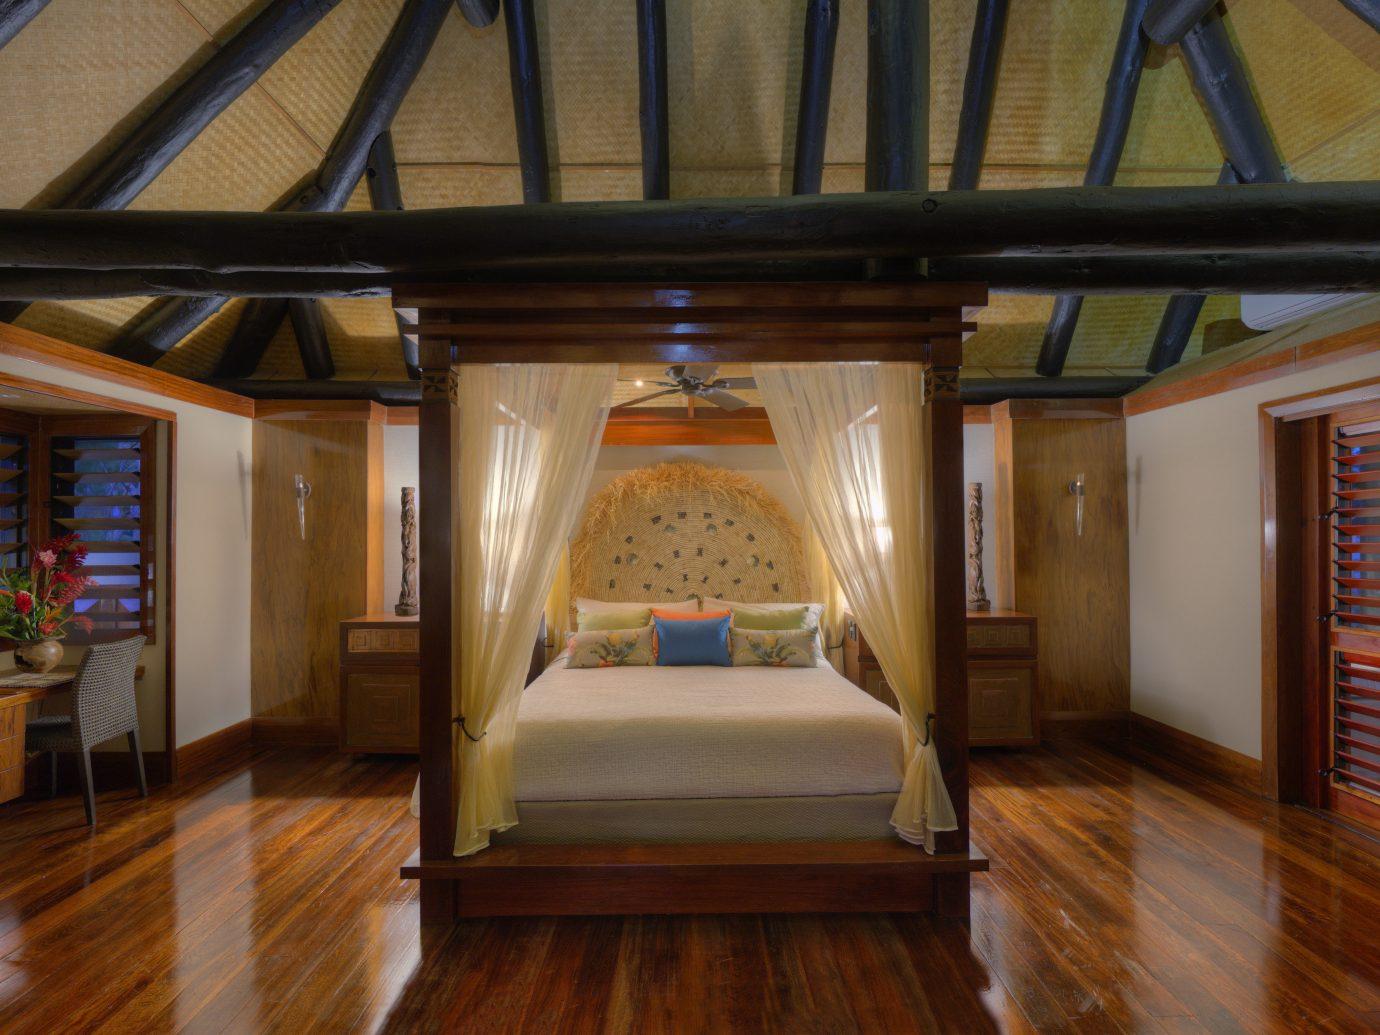 All-Inclusive Resorts Boutique Hotels Hotels Romance floor indoor room ceiling estate interior design wood wooden real estate home flooring window